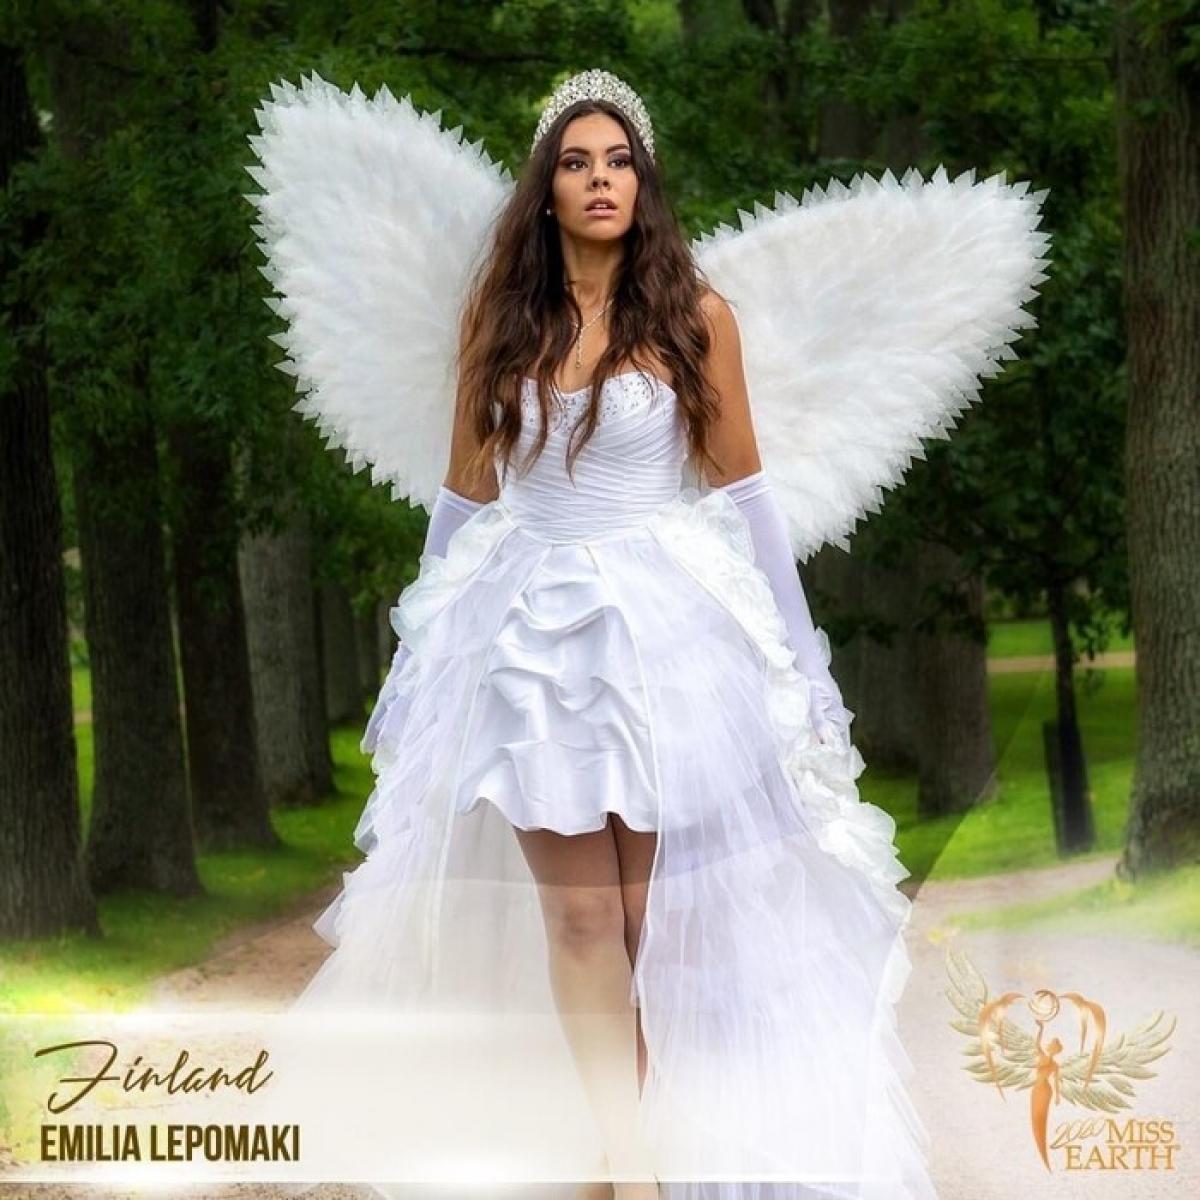 Emilia Lepomaki of Finland